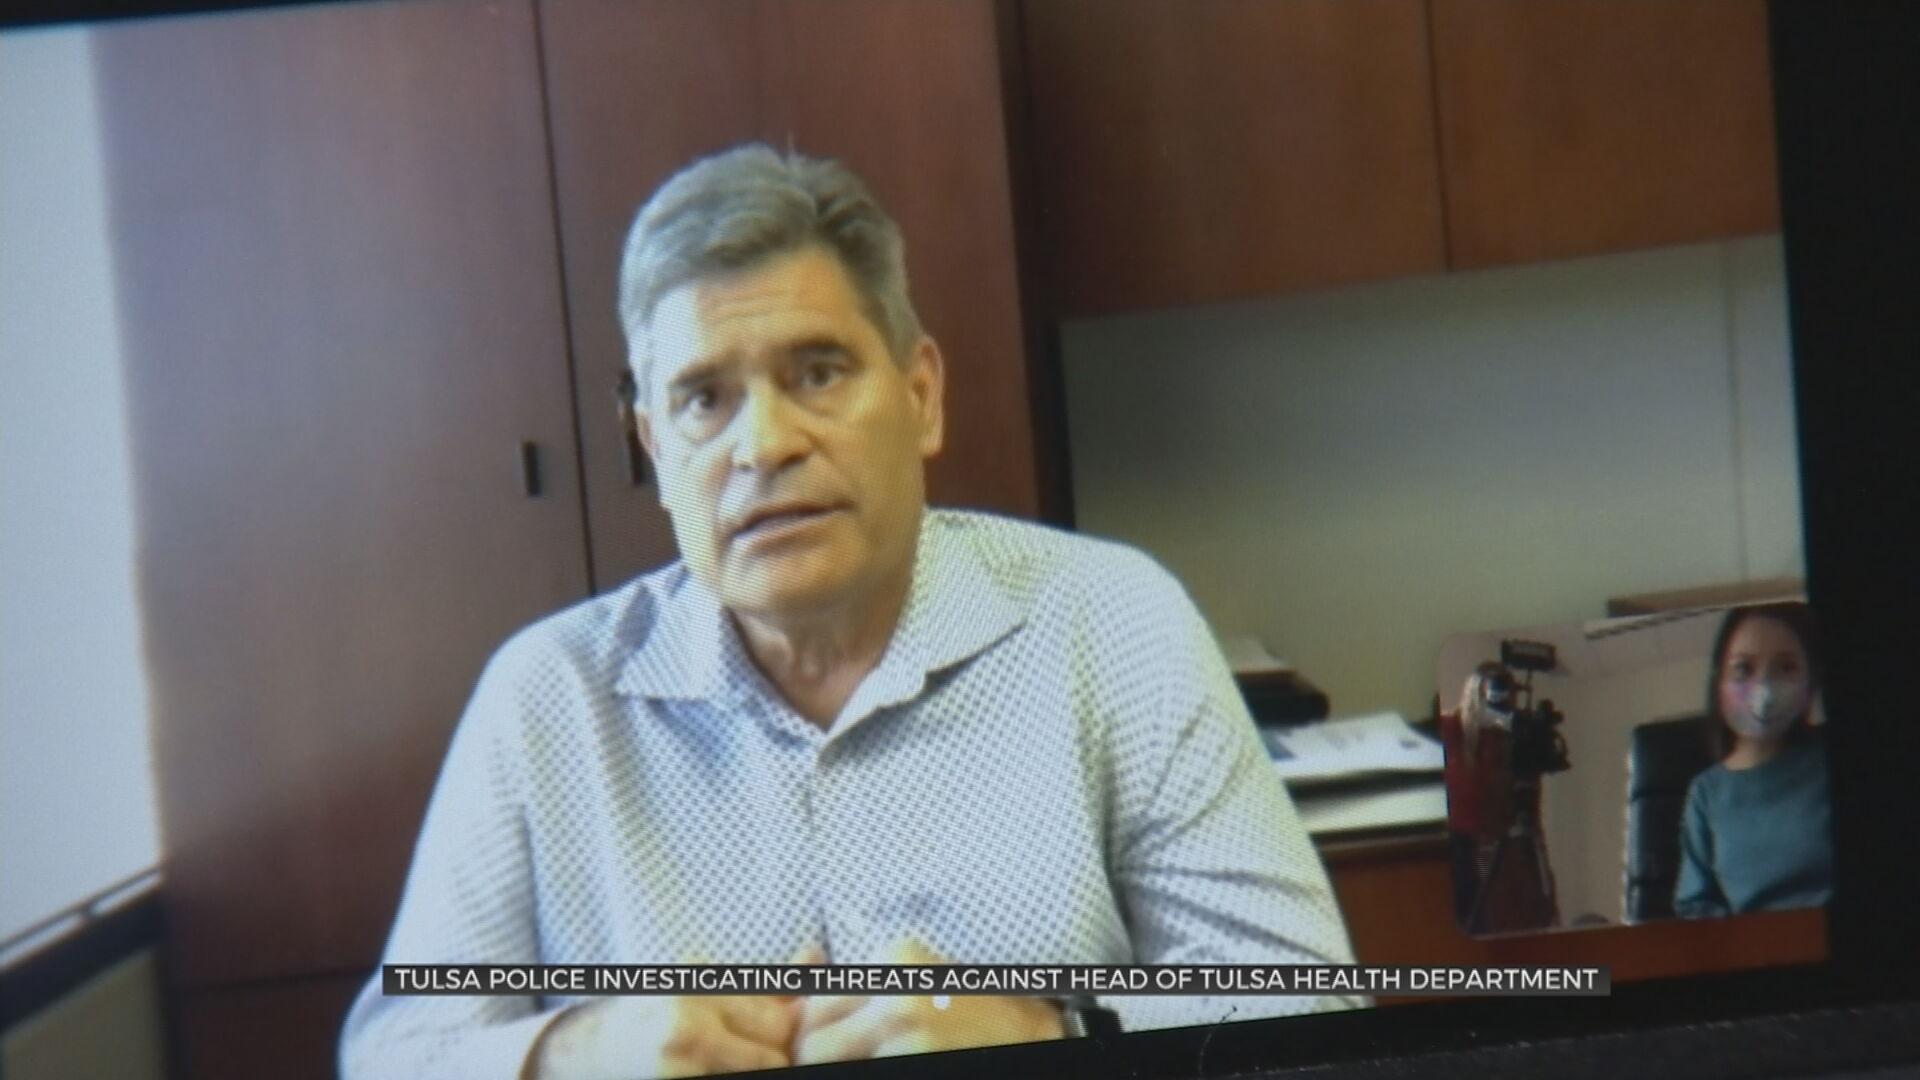 Police Investigate Threats Against Head Of Tulsa Health Department